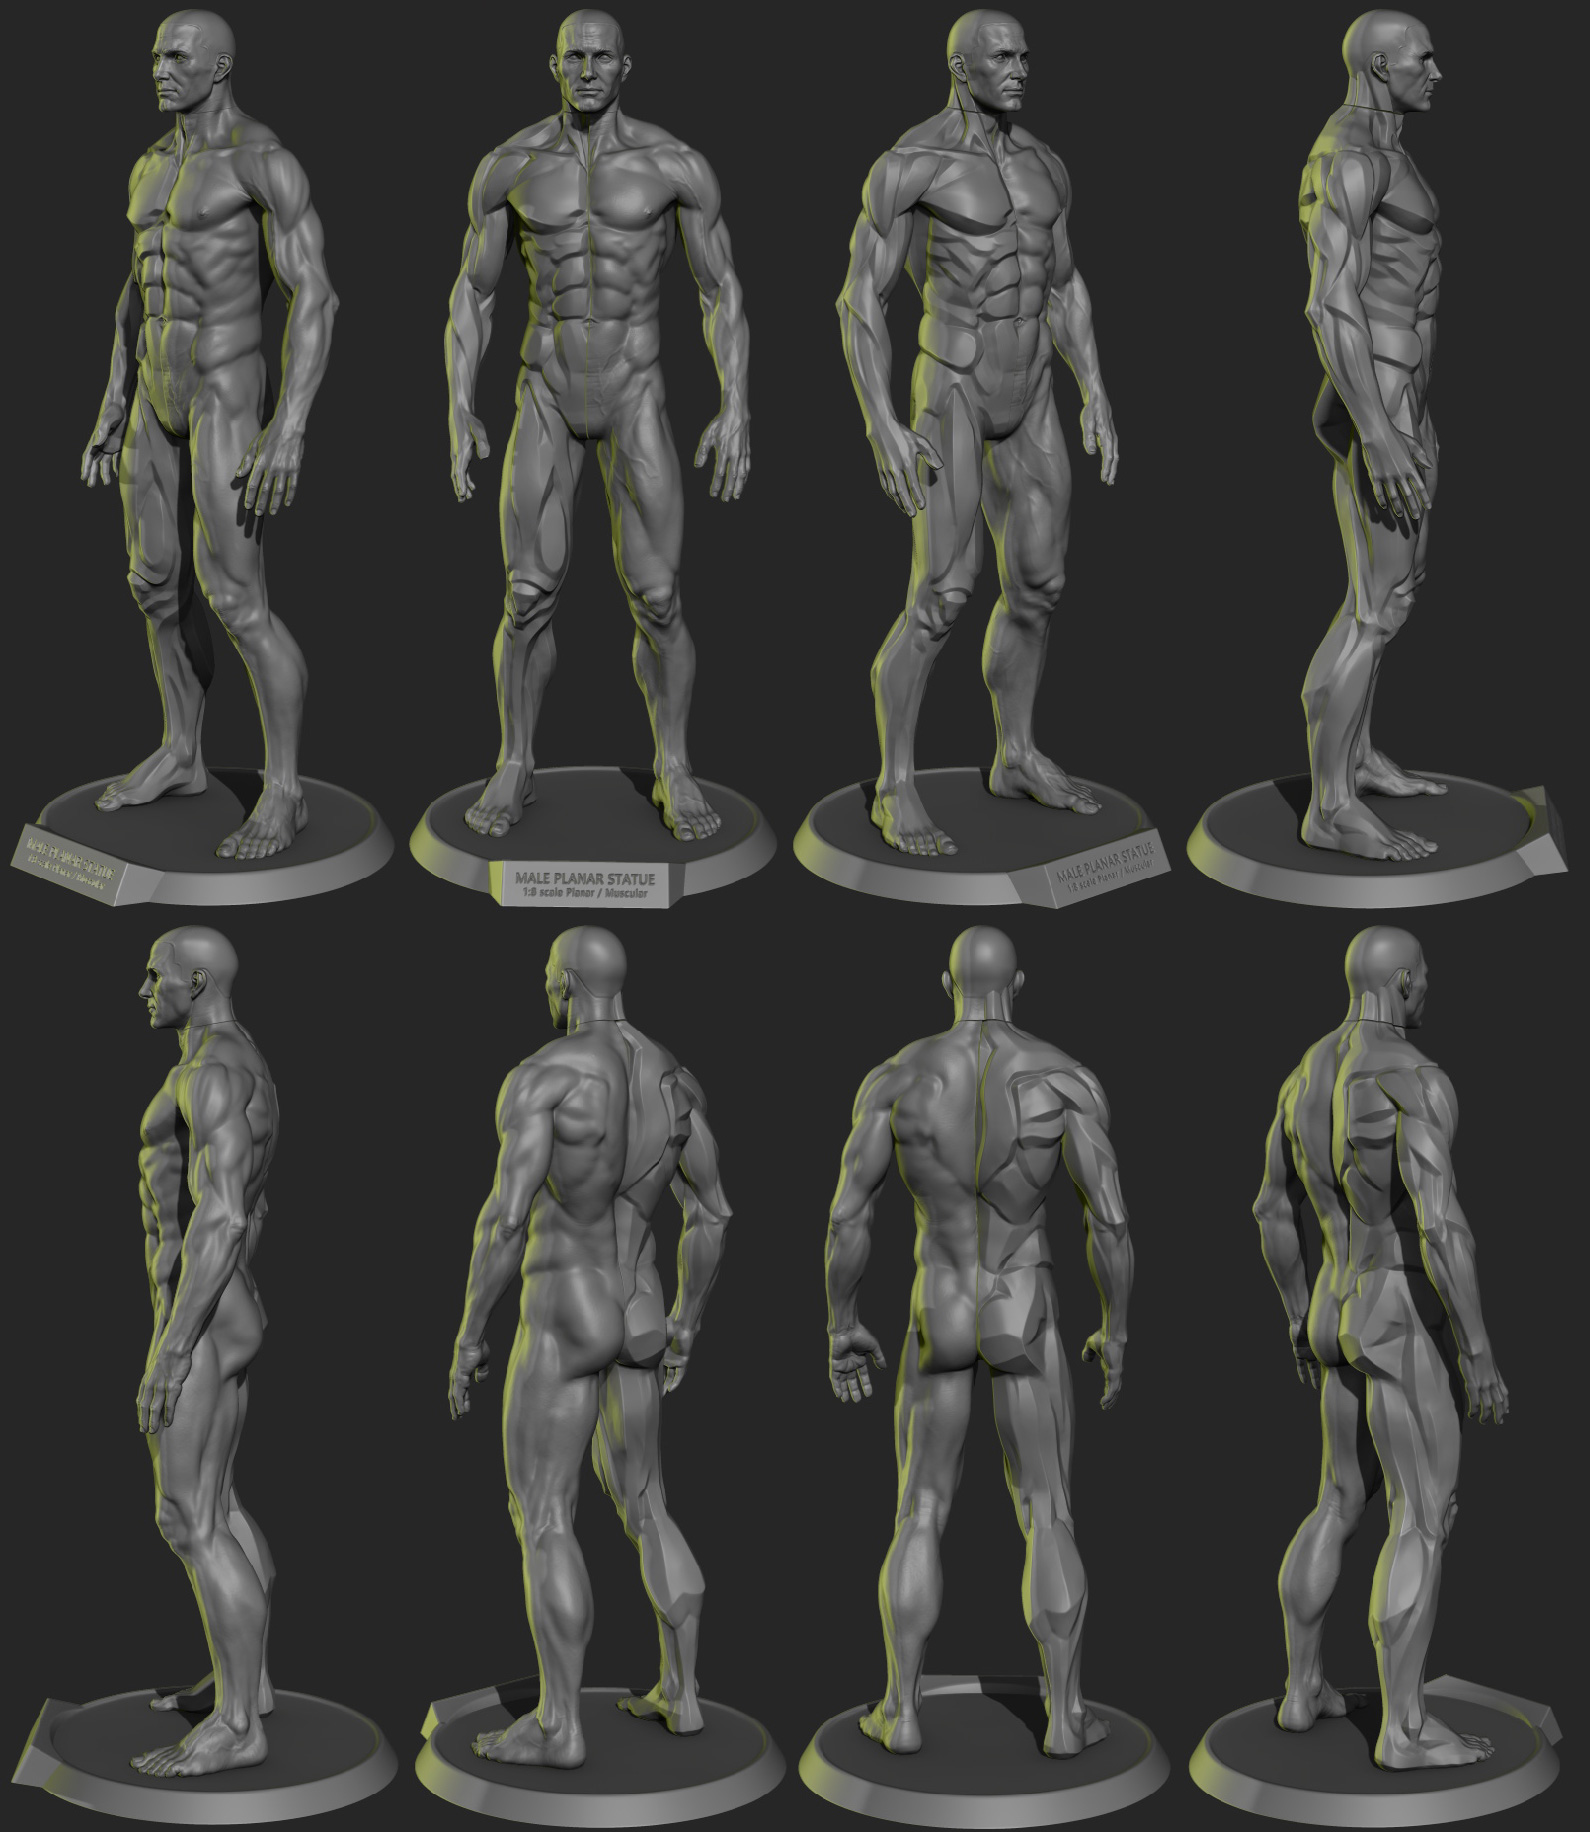 Male Anatomy Model Gallery - human body anatomy